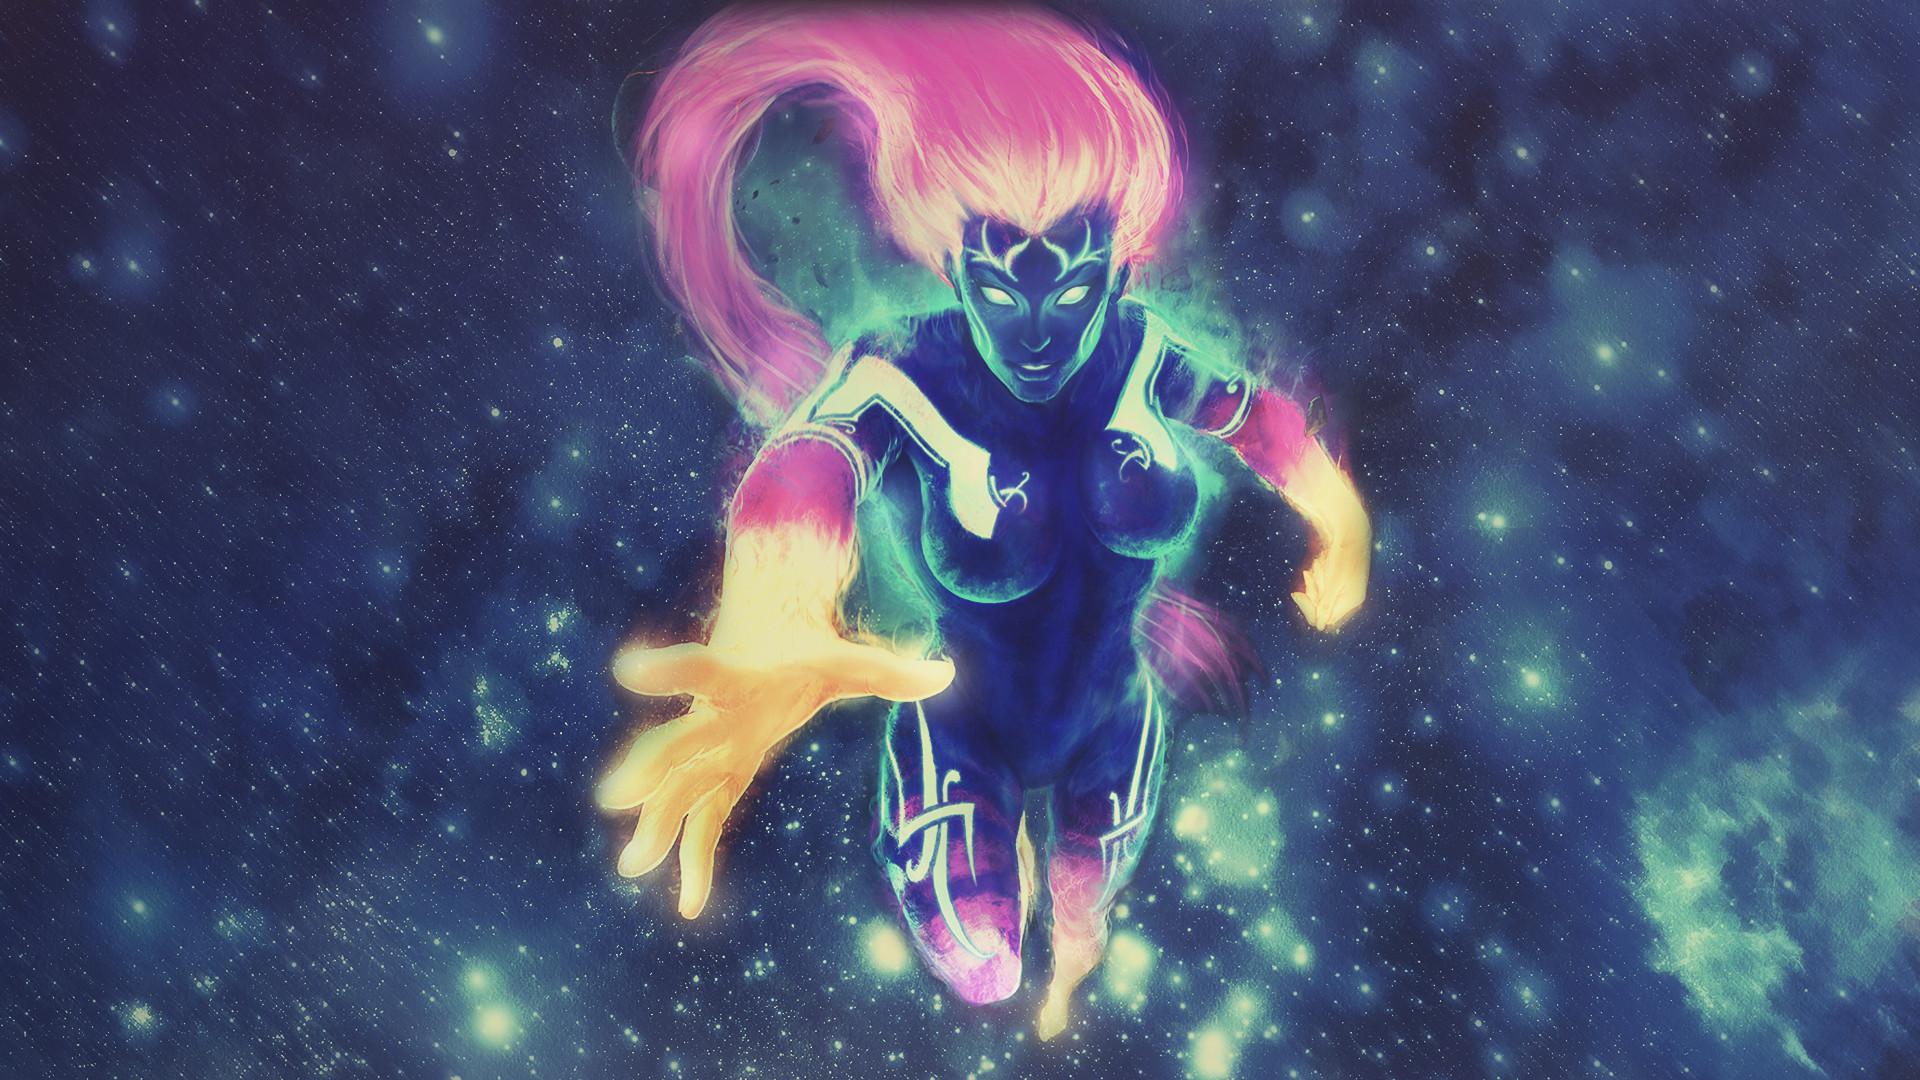 … Supernova Sol – SMITE Wallpaper by DustyMcBacon